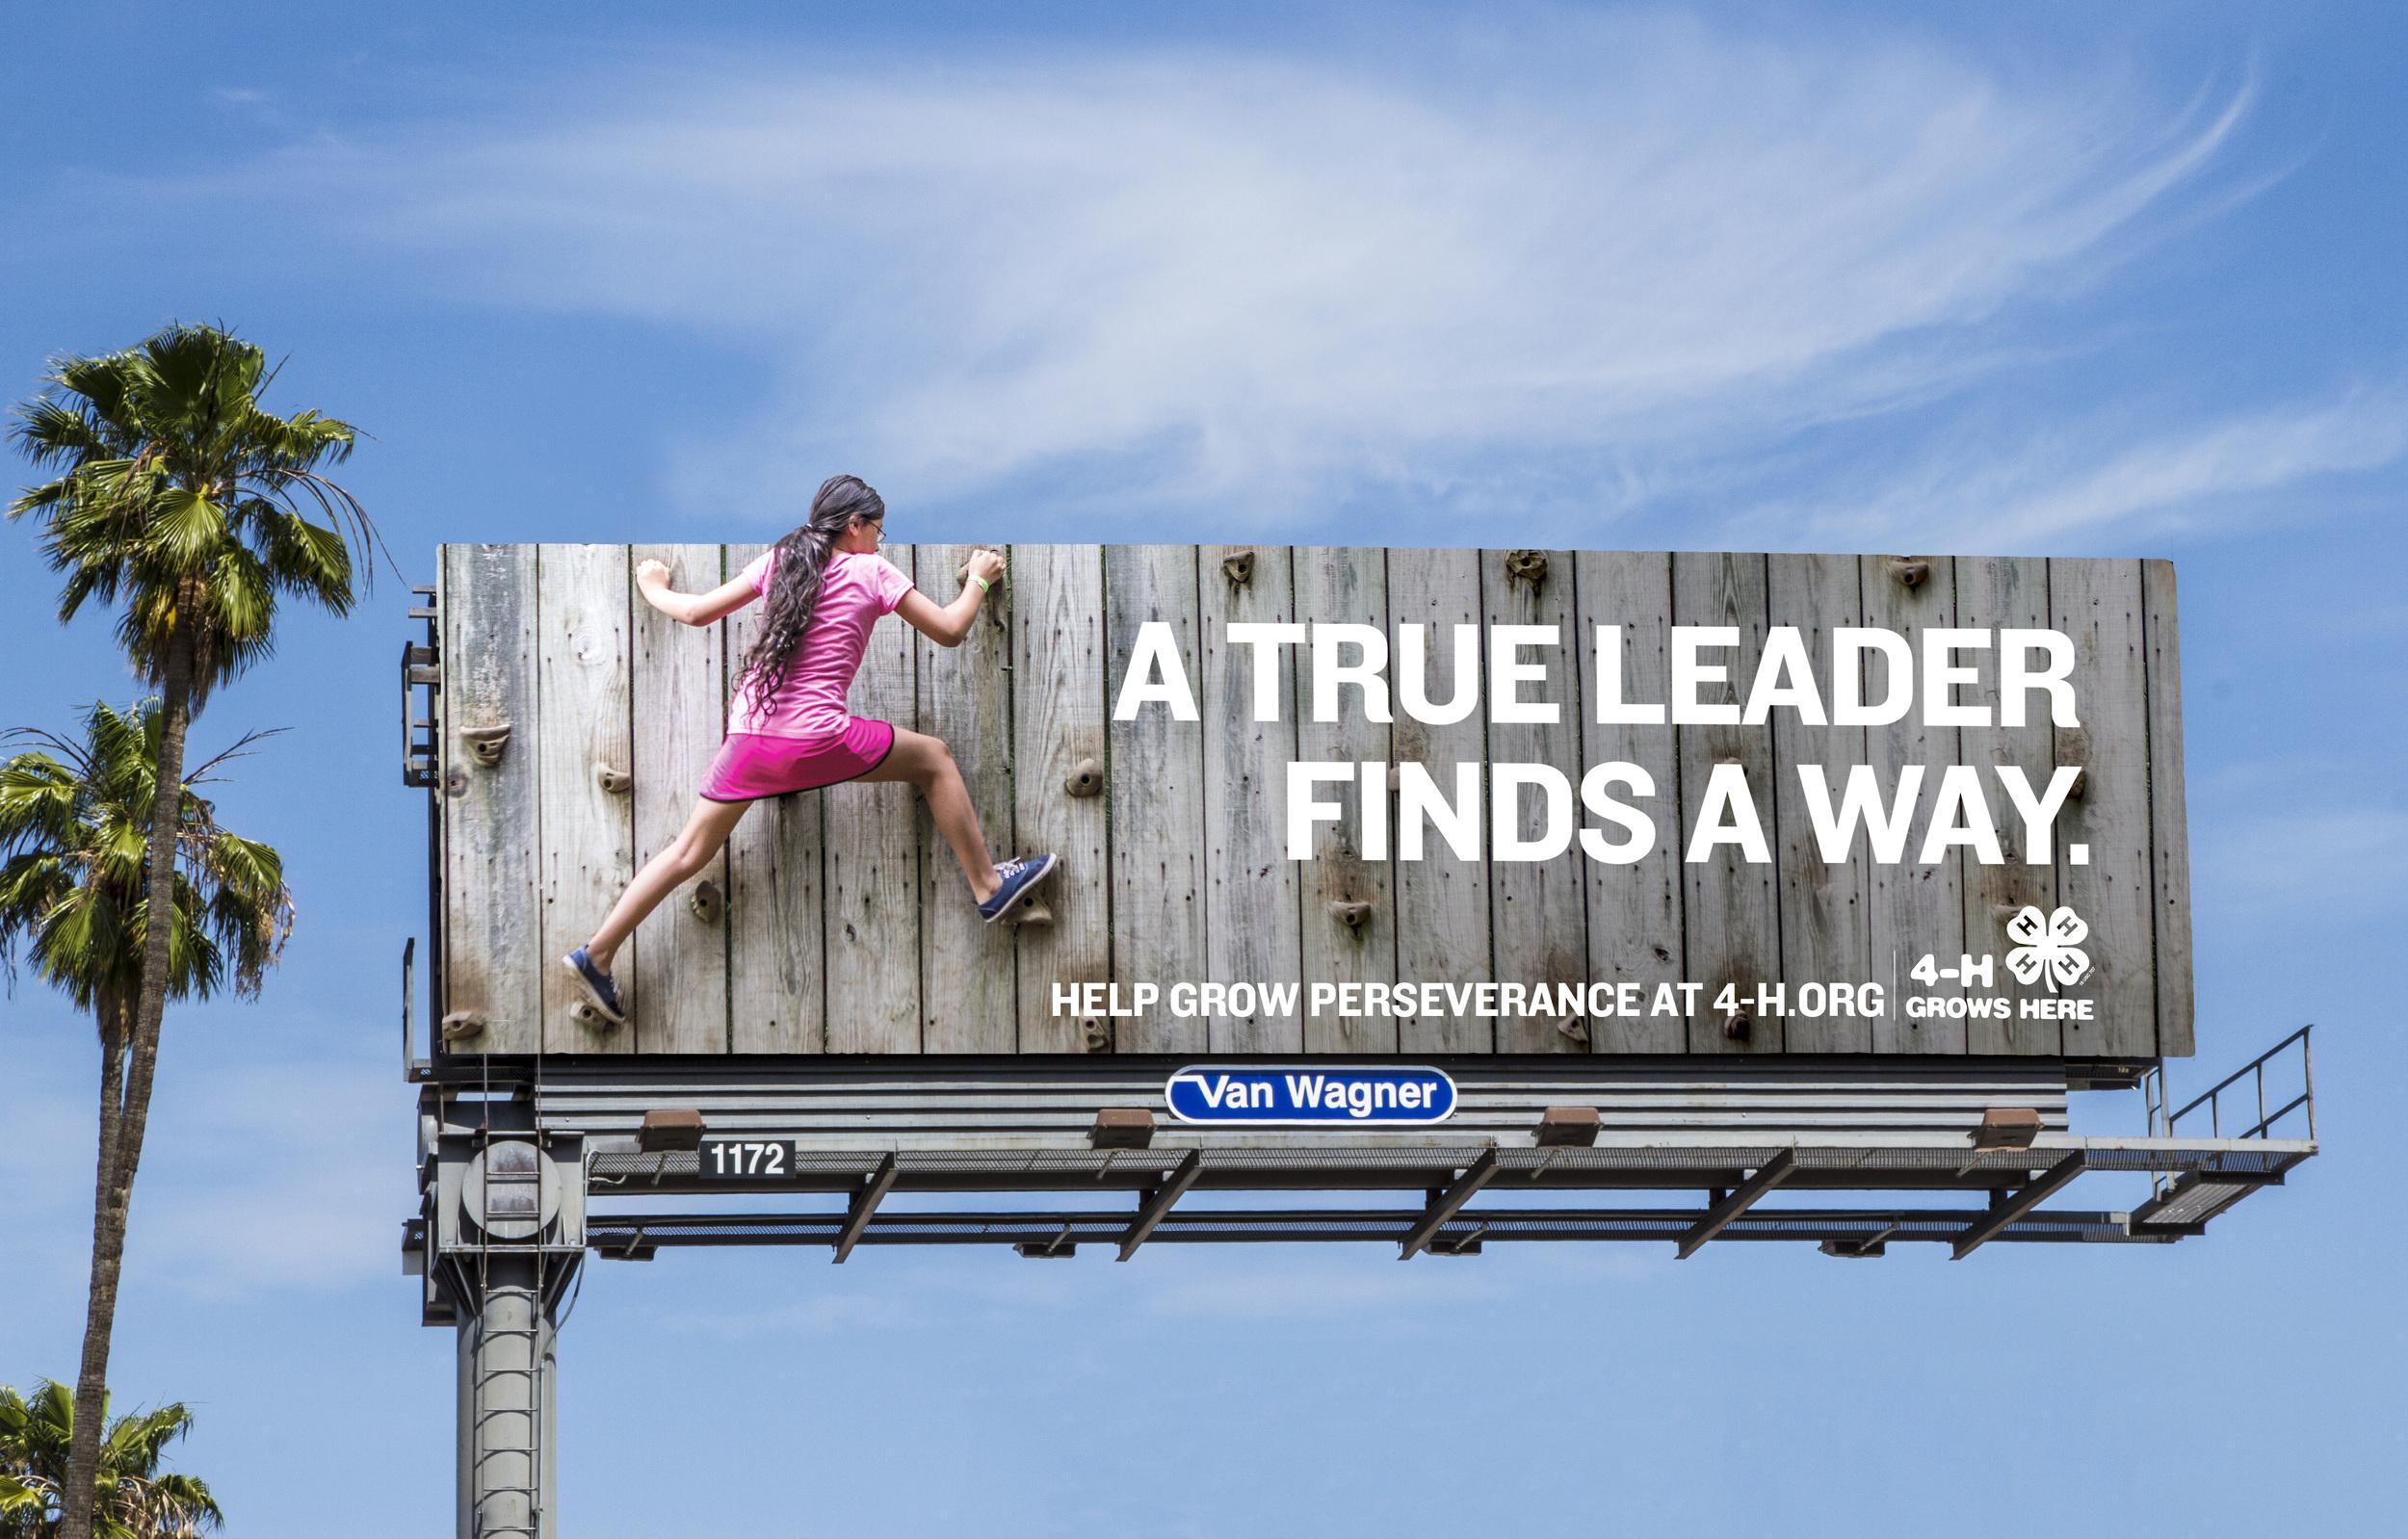 Outdoor billboard for 4H